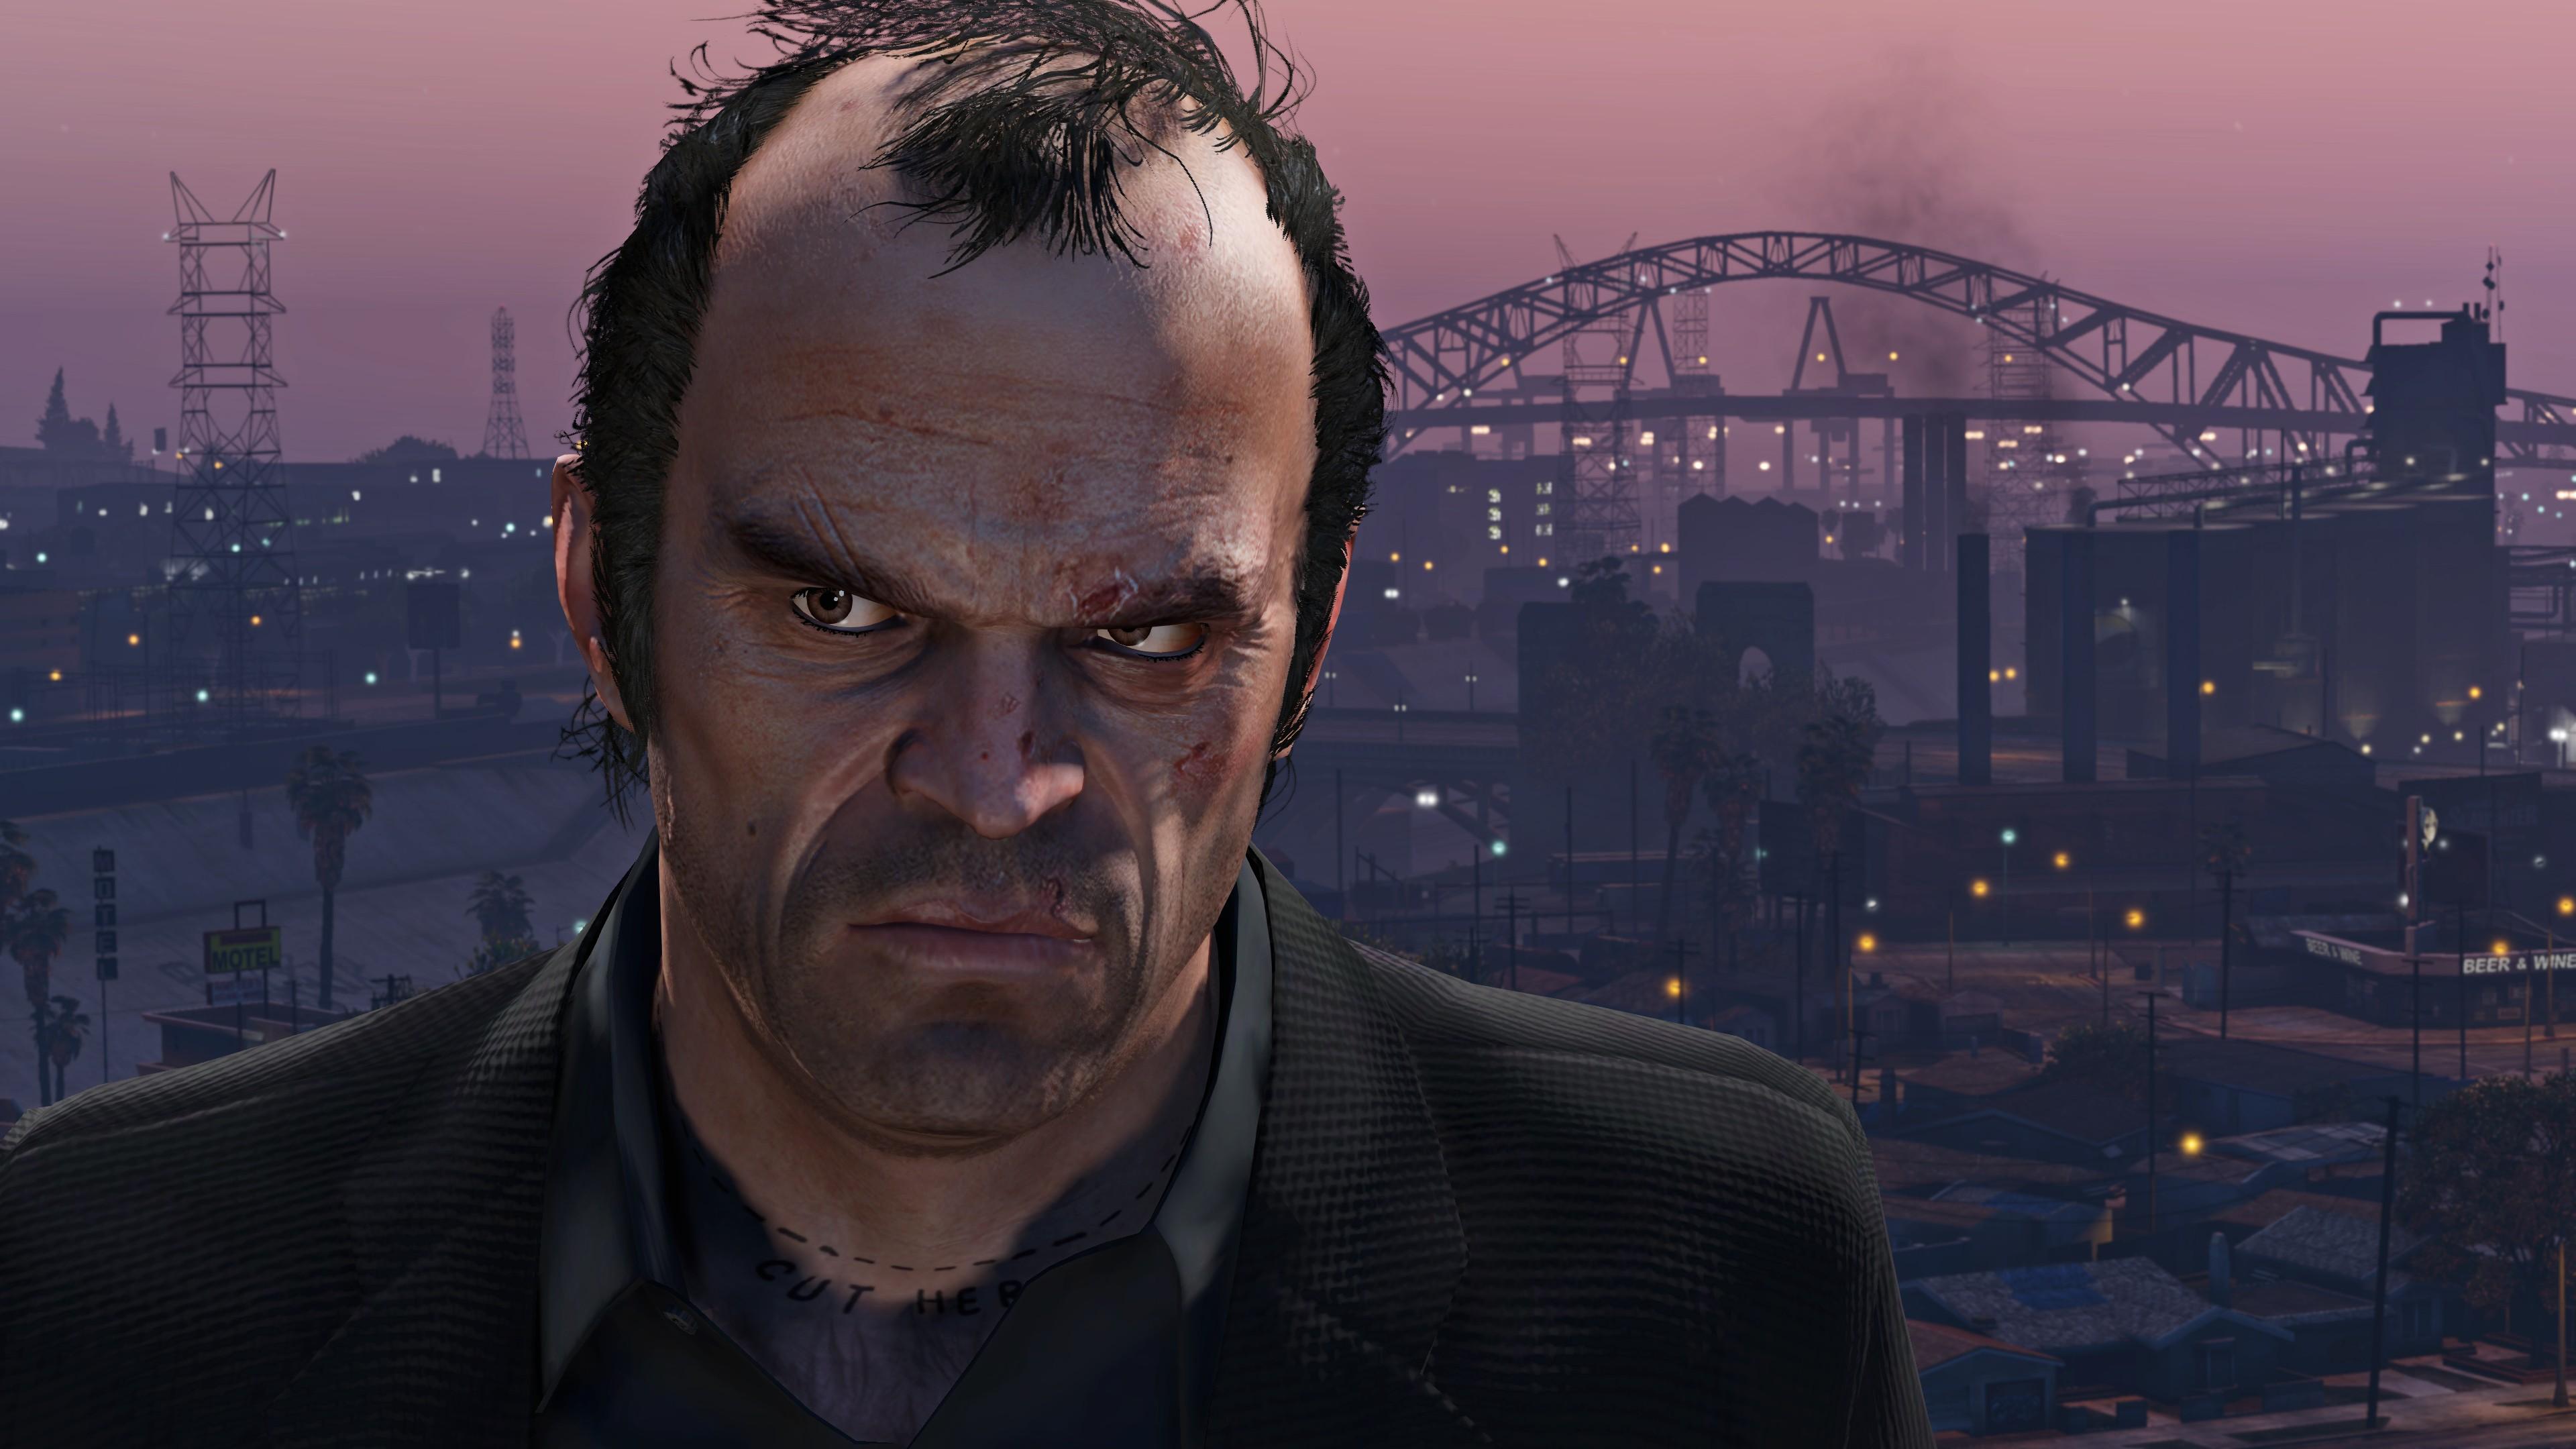 Mé dojmy z hraní I: Grand Theft Auto V (PC) 107780